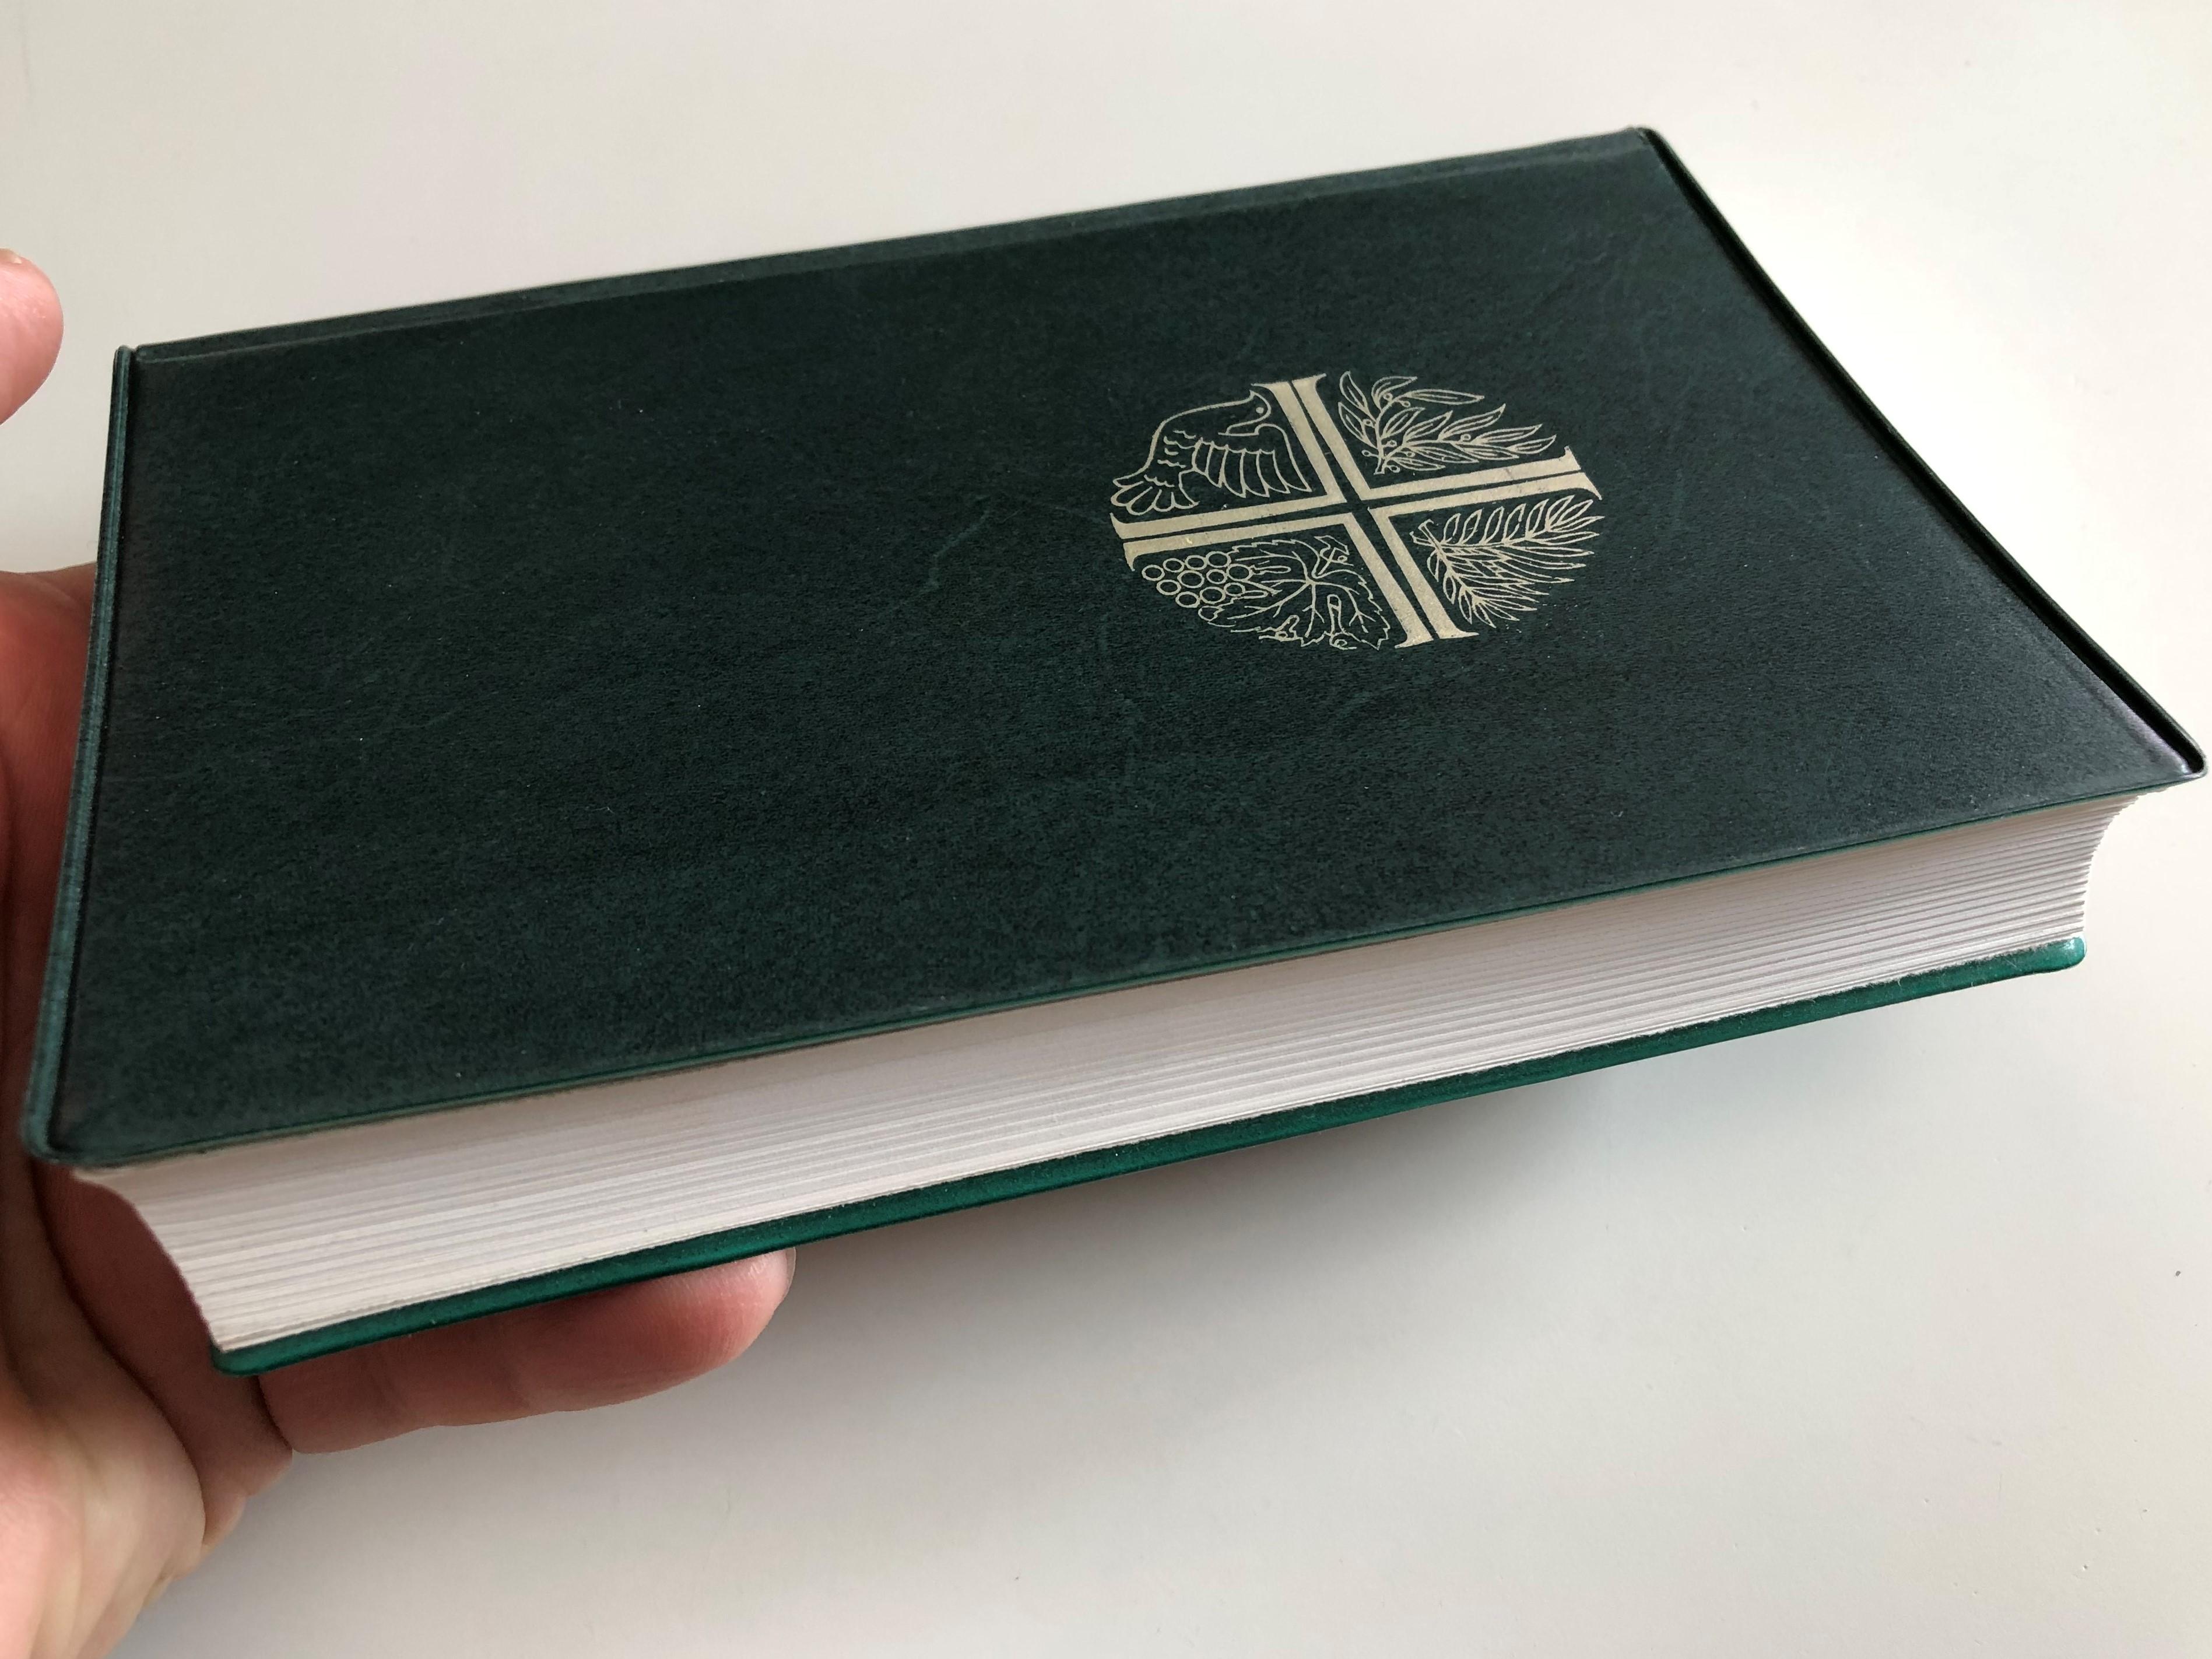 serbian-new-testament-novi-zavet-emilijan-m.-arni-3.jpg